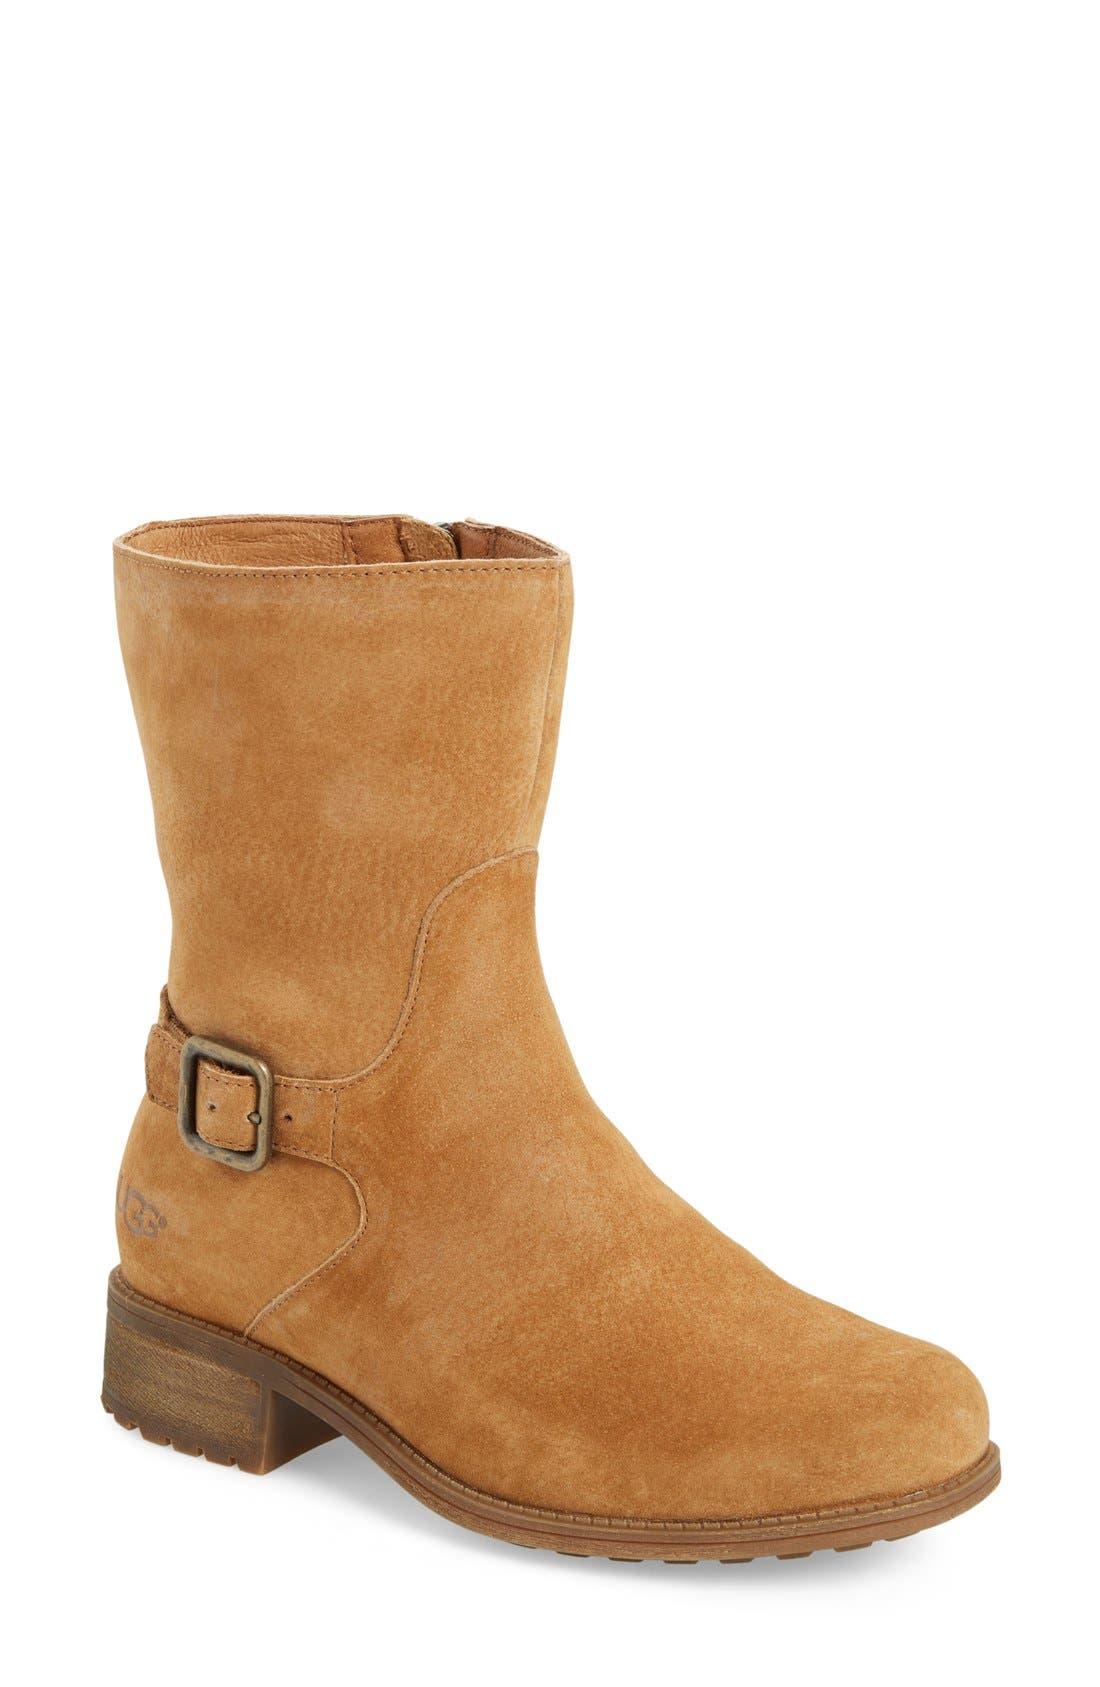 Main Image - UGG® Keppler Genuine Shearling Lined Moto Boot (Women)